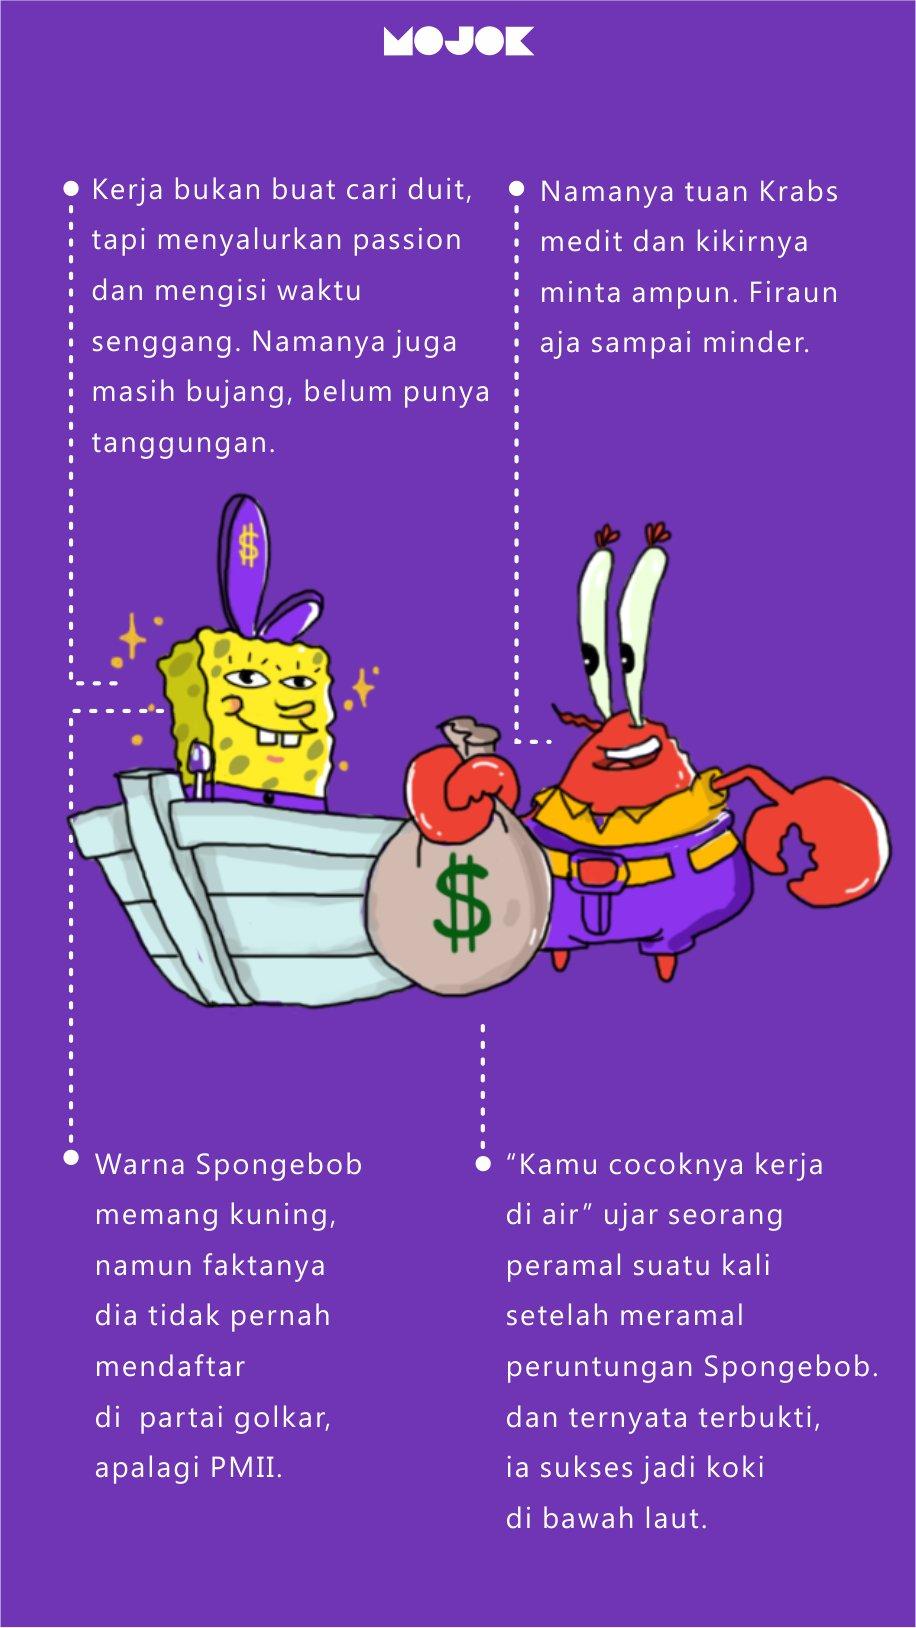 gaji spongebob